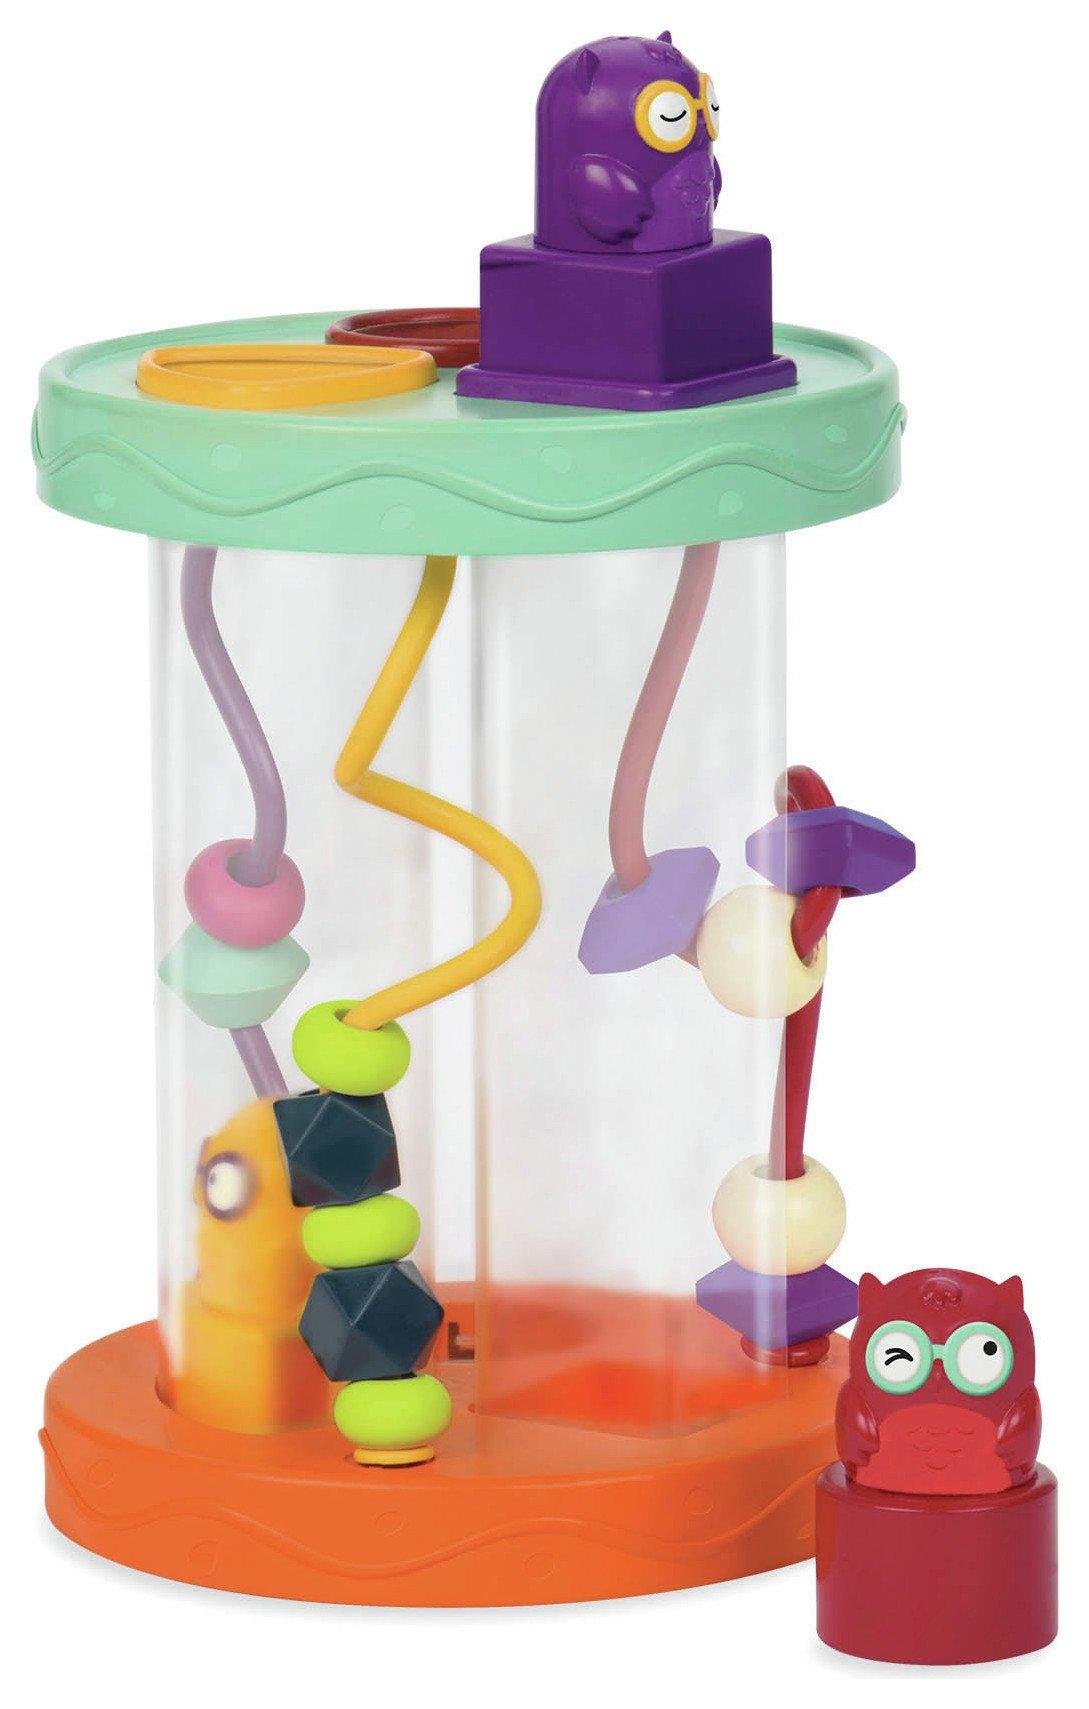 Image of B Baby Hooty-Hoo Baby Toy.